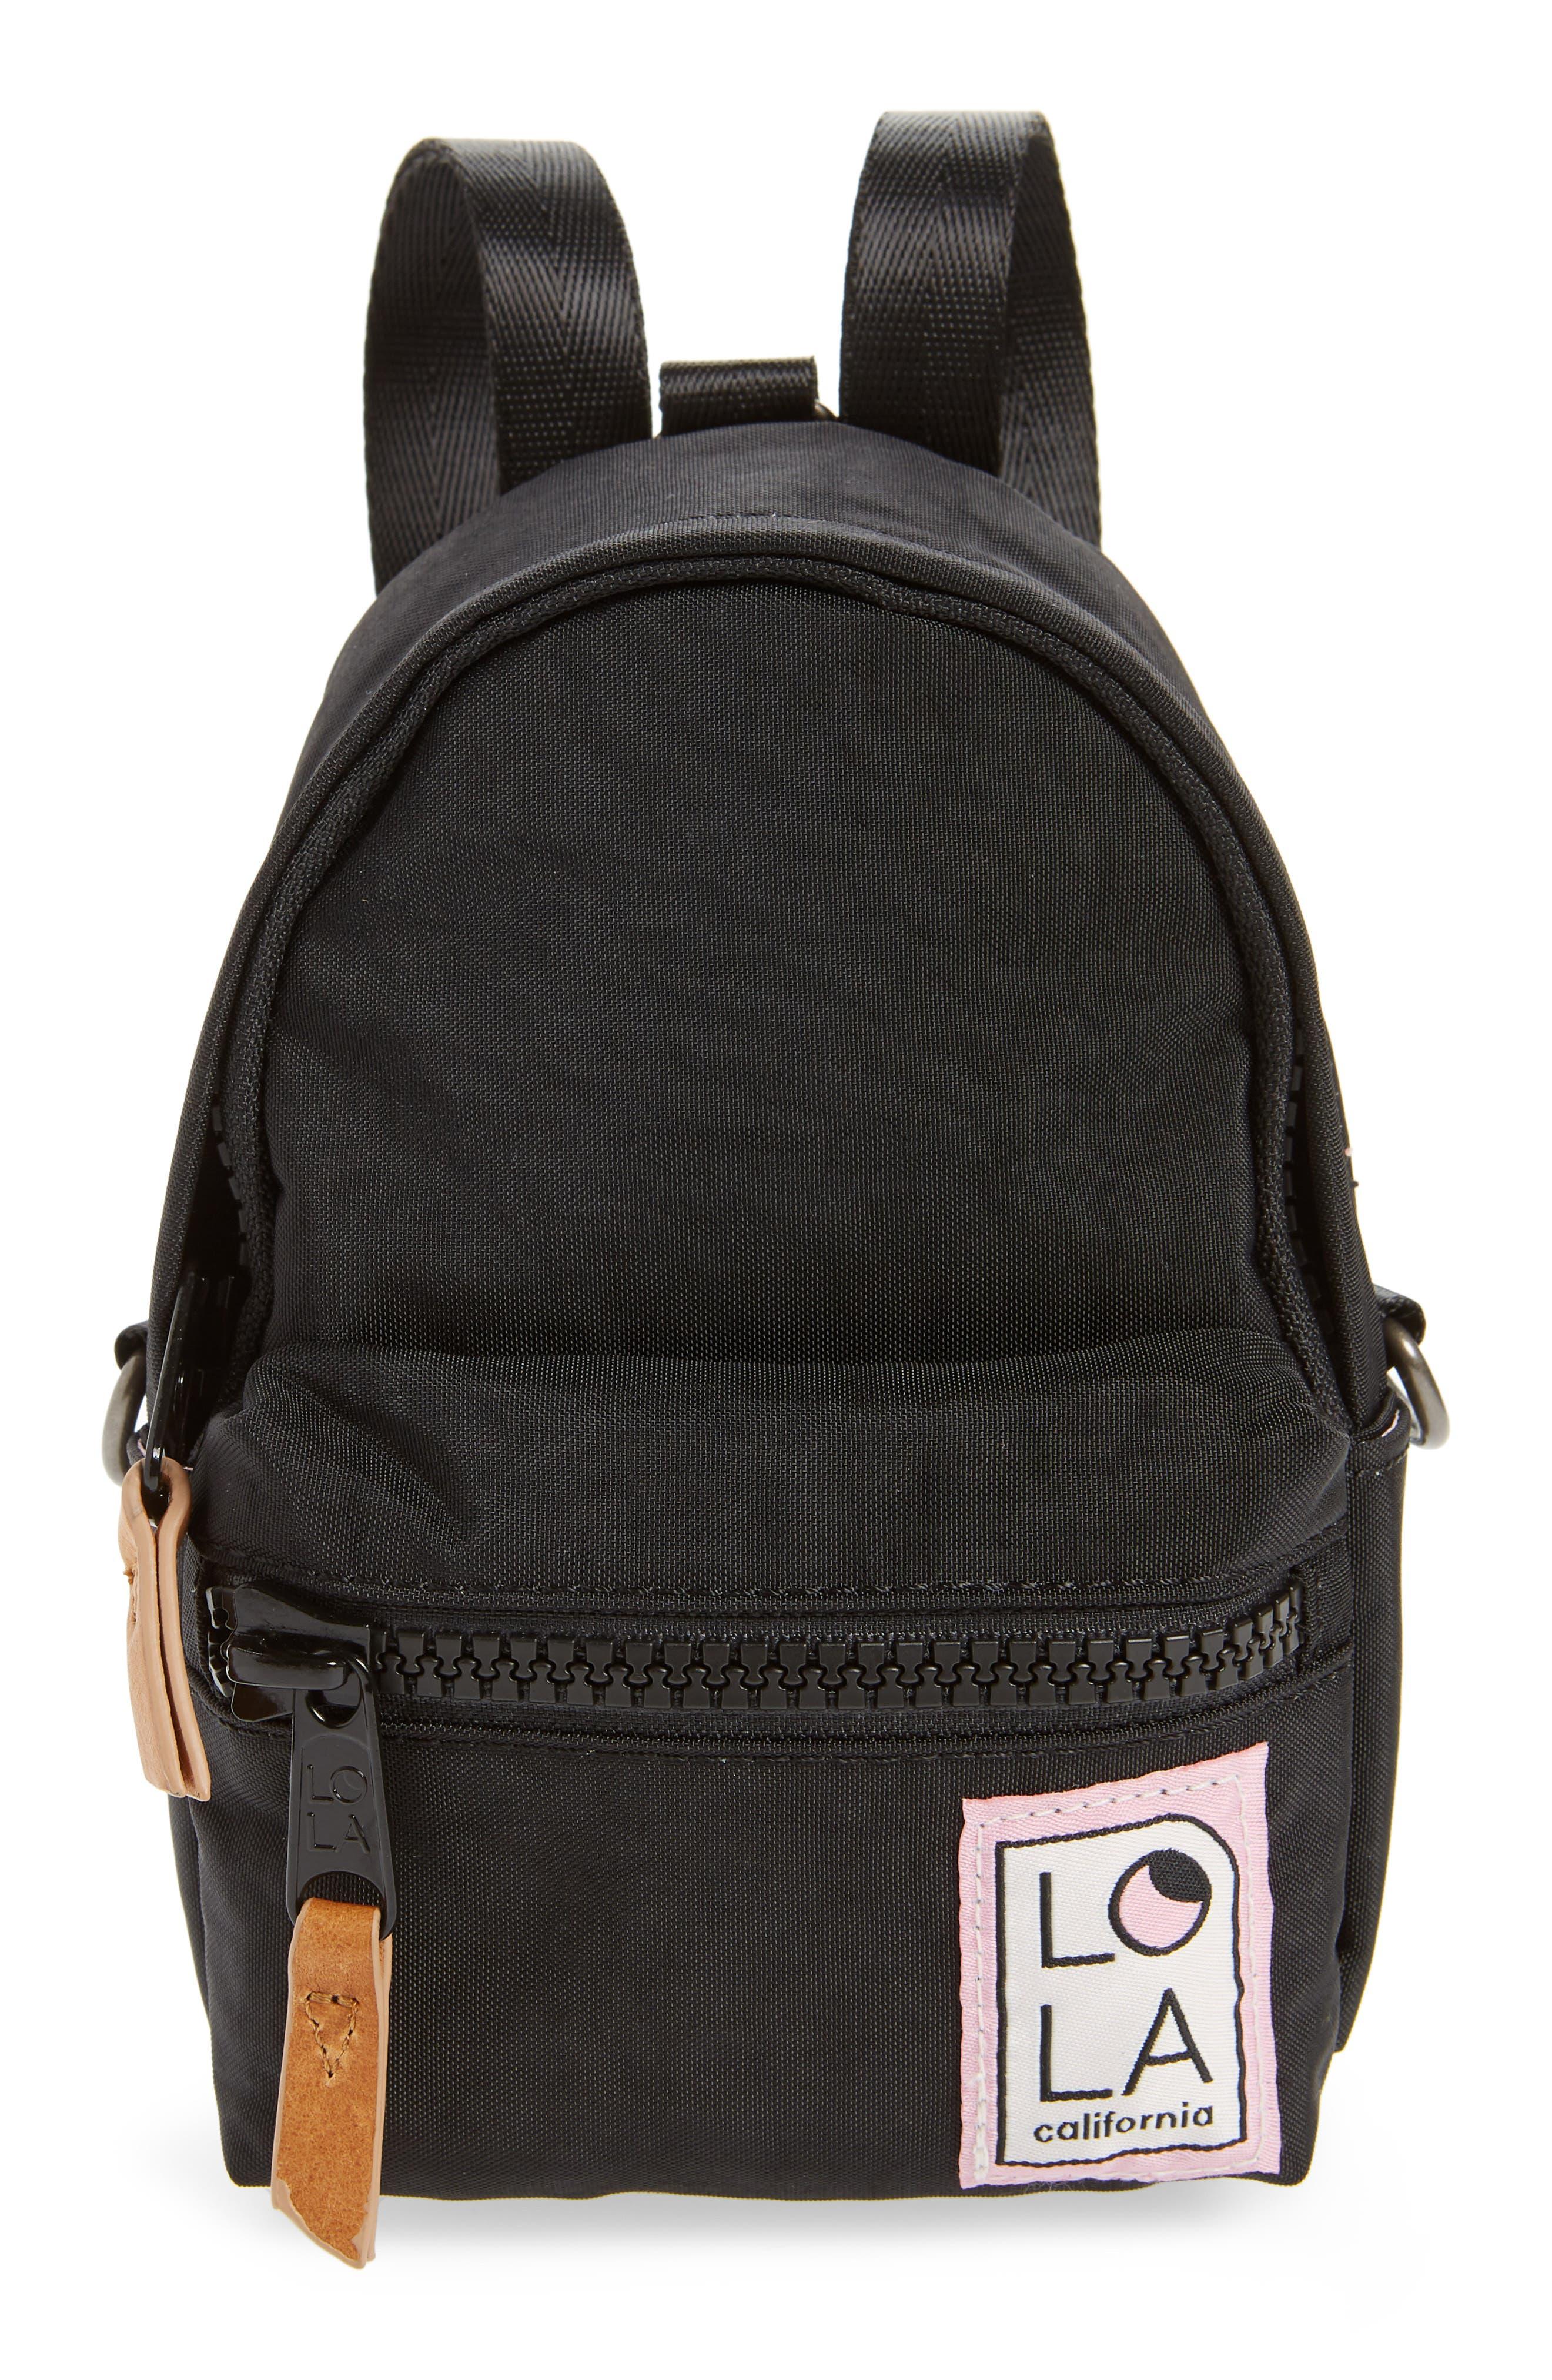 Lola Los Angeles Stargazer Mini Convertible Backpack - Black